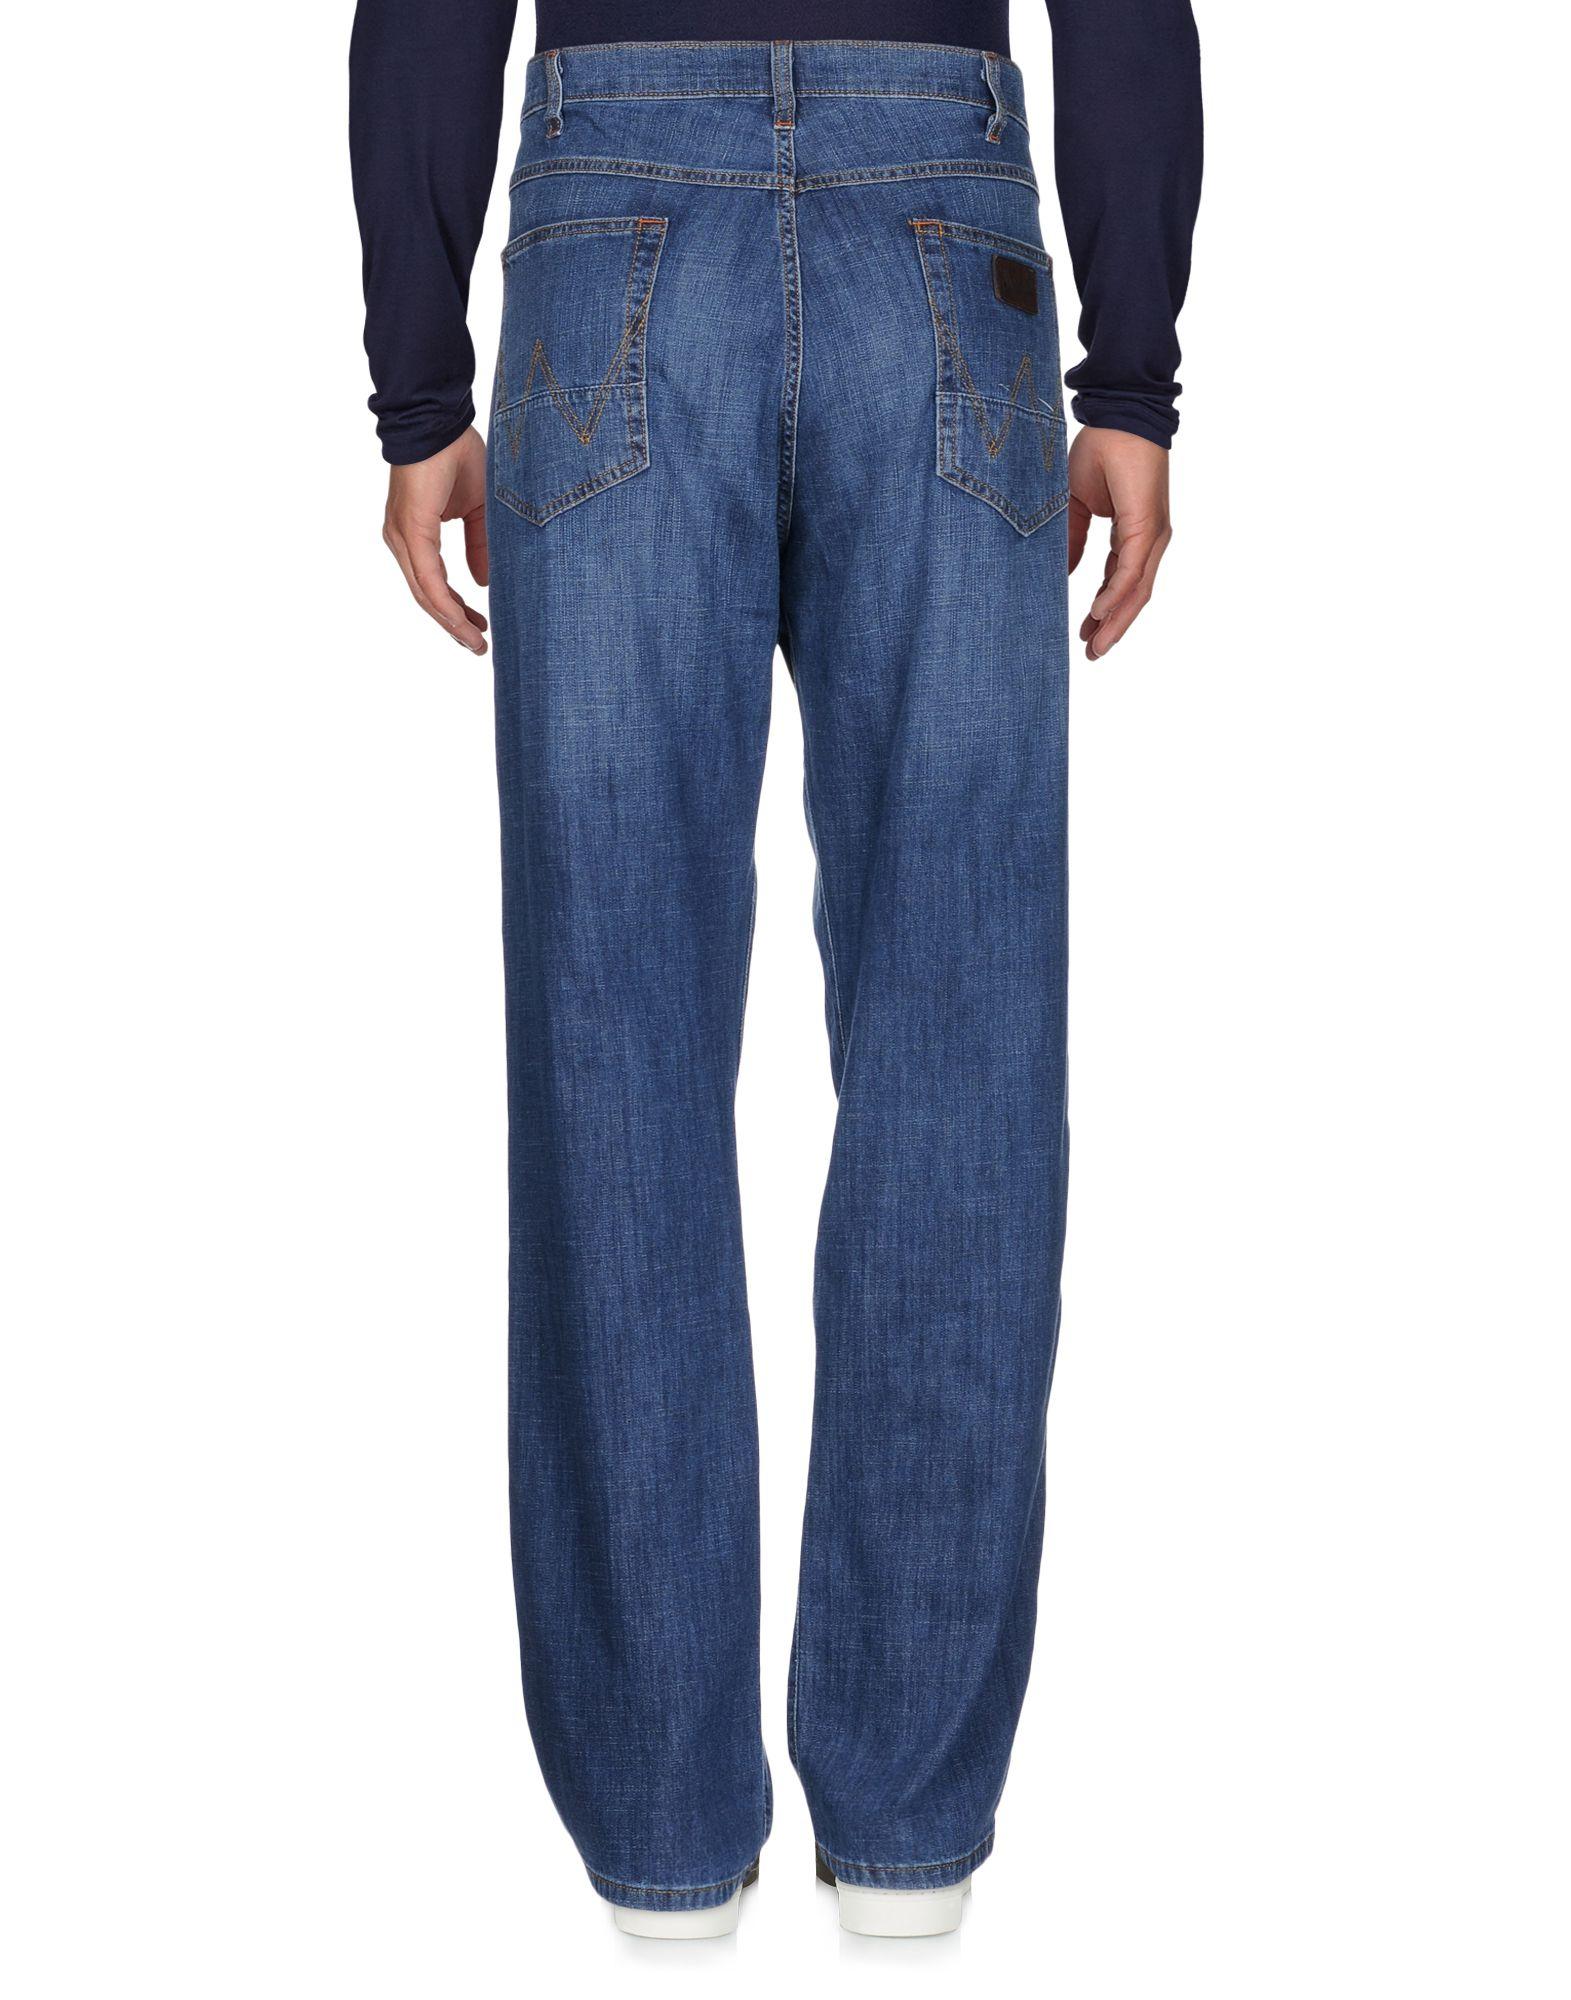 Pantaloni Uomo Jeans Wrangler Uomo Pantaloni - 42681959EA baa9c6